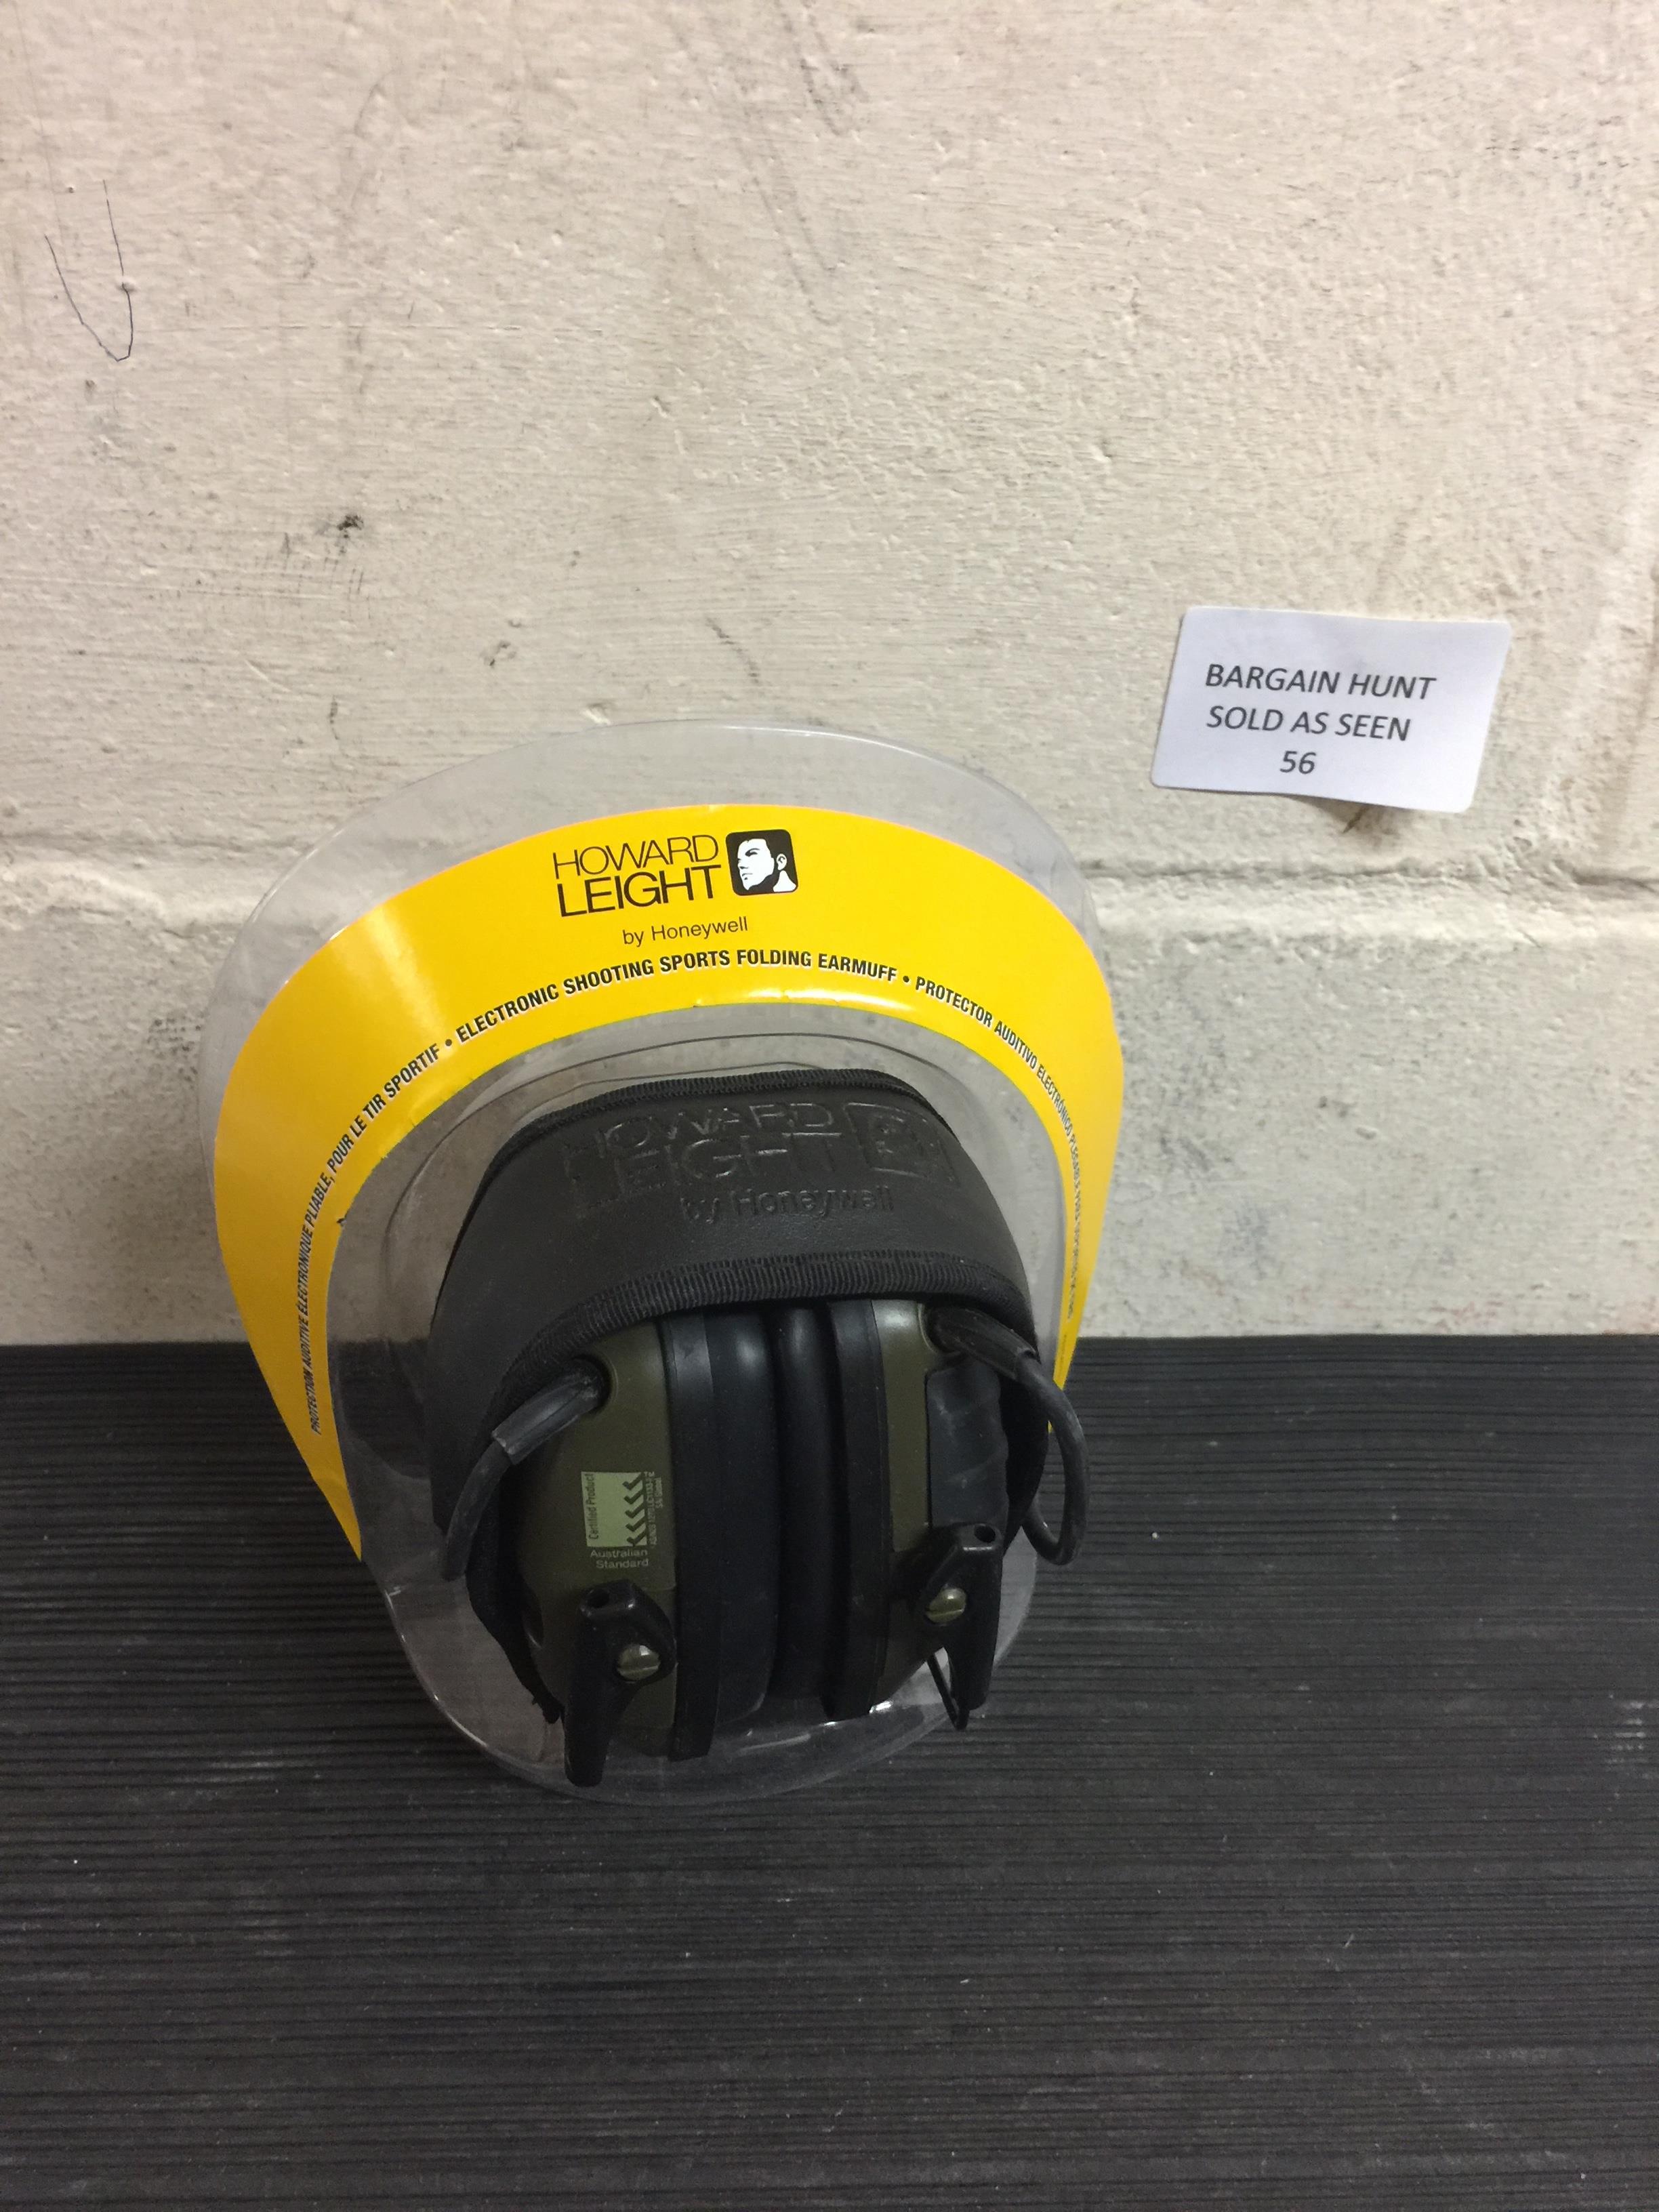 Lot 56 - Honeywell Howard Leight Impact Sport Foldable Ear Defender